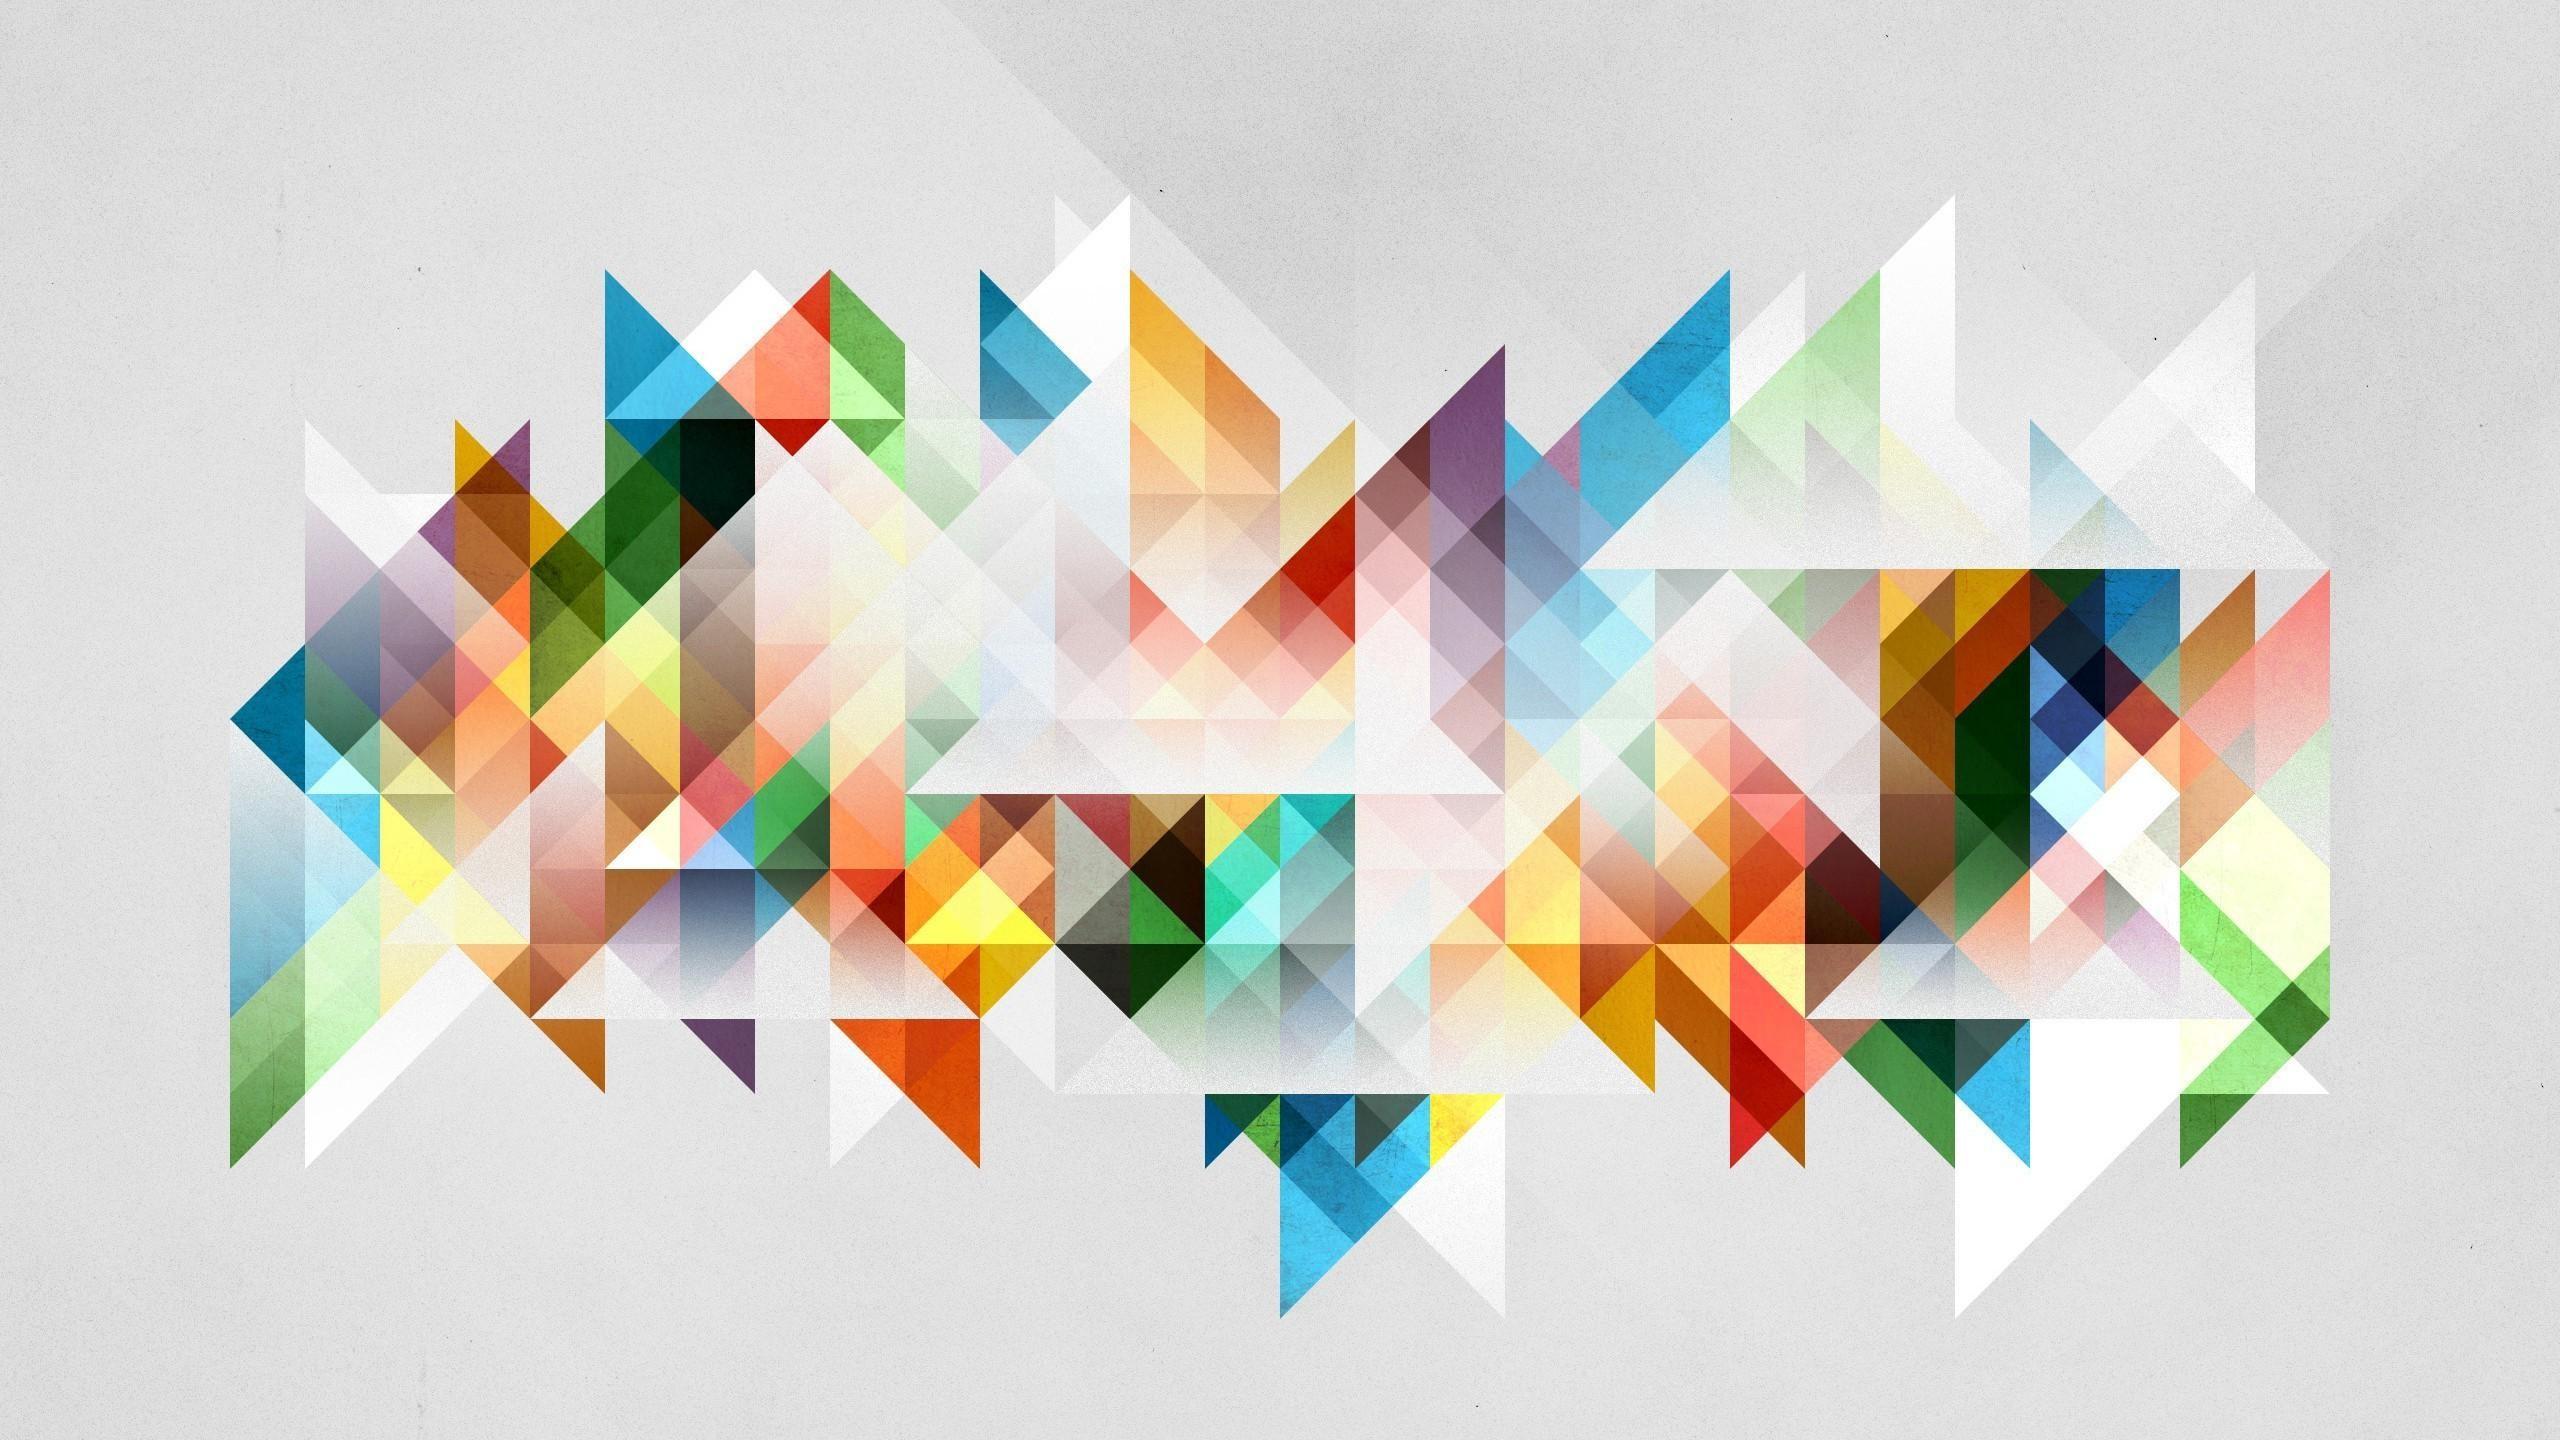 … Abstract 1920#U00d71080 Wallpapers High Resolution Iphone 4k Light Hd ..